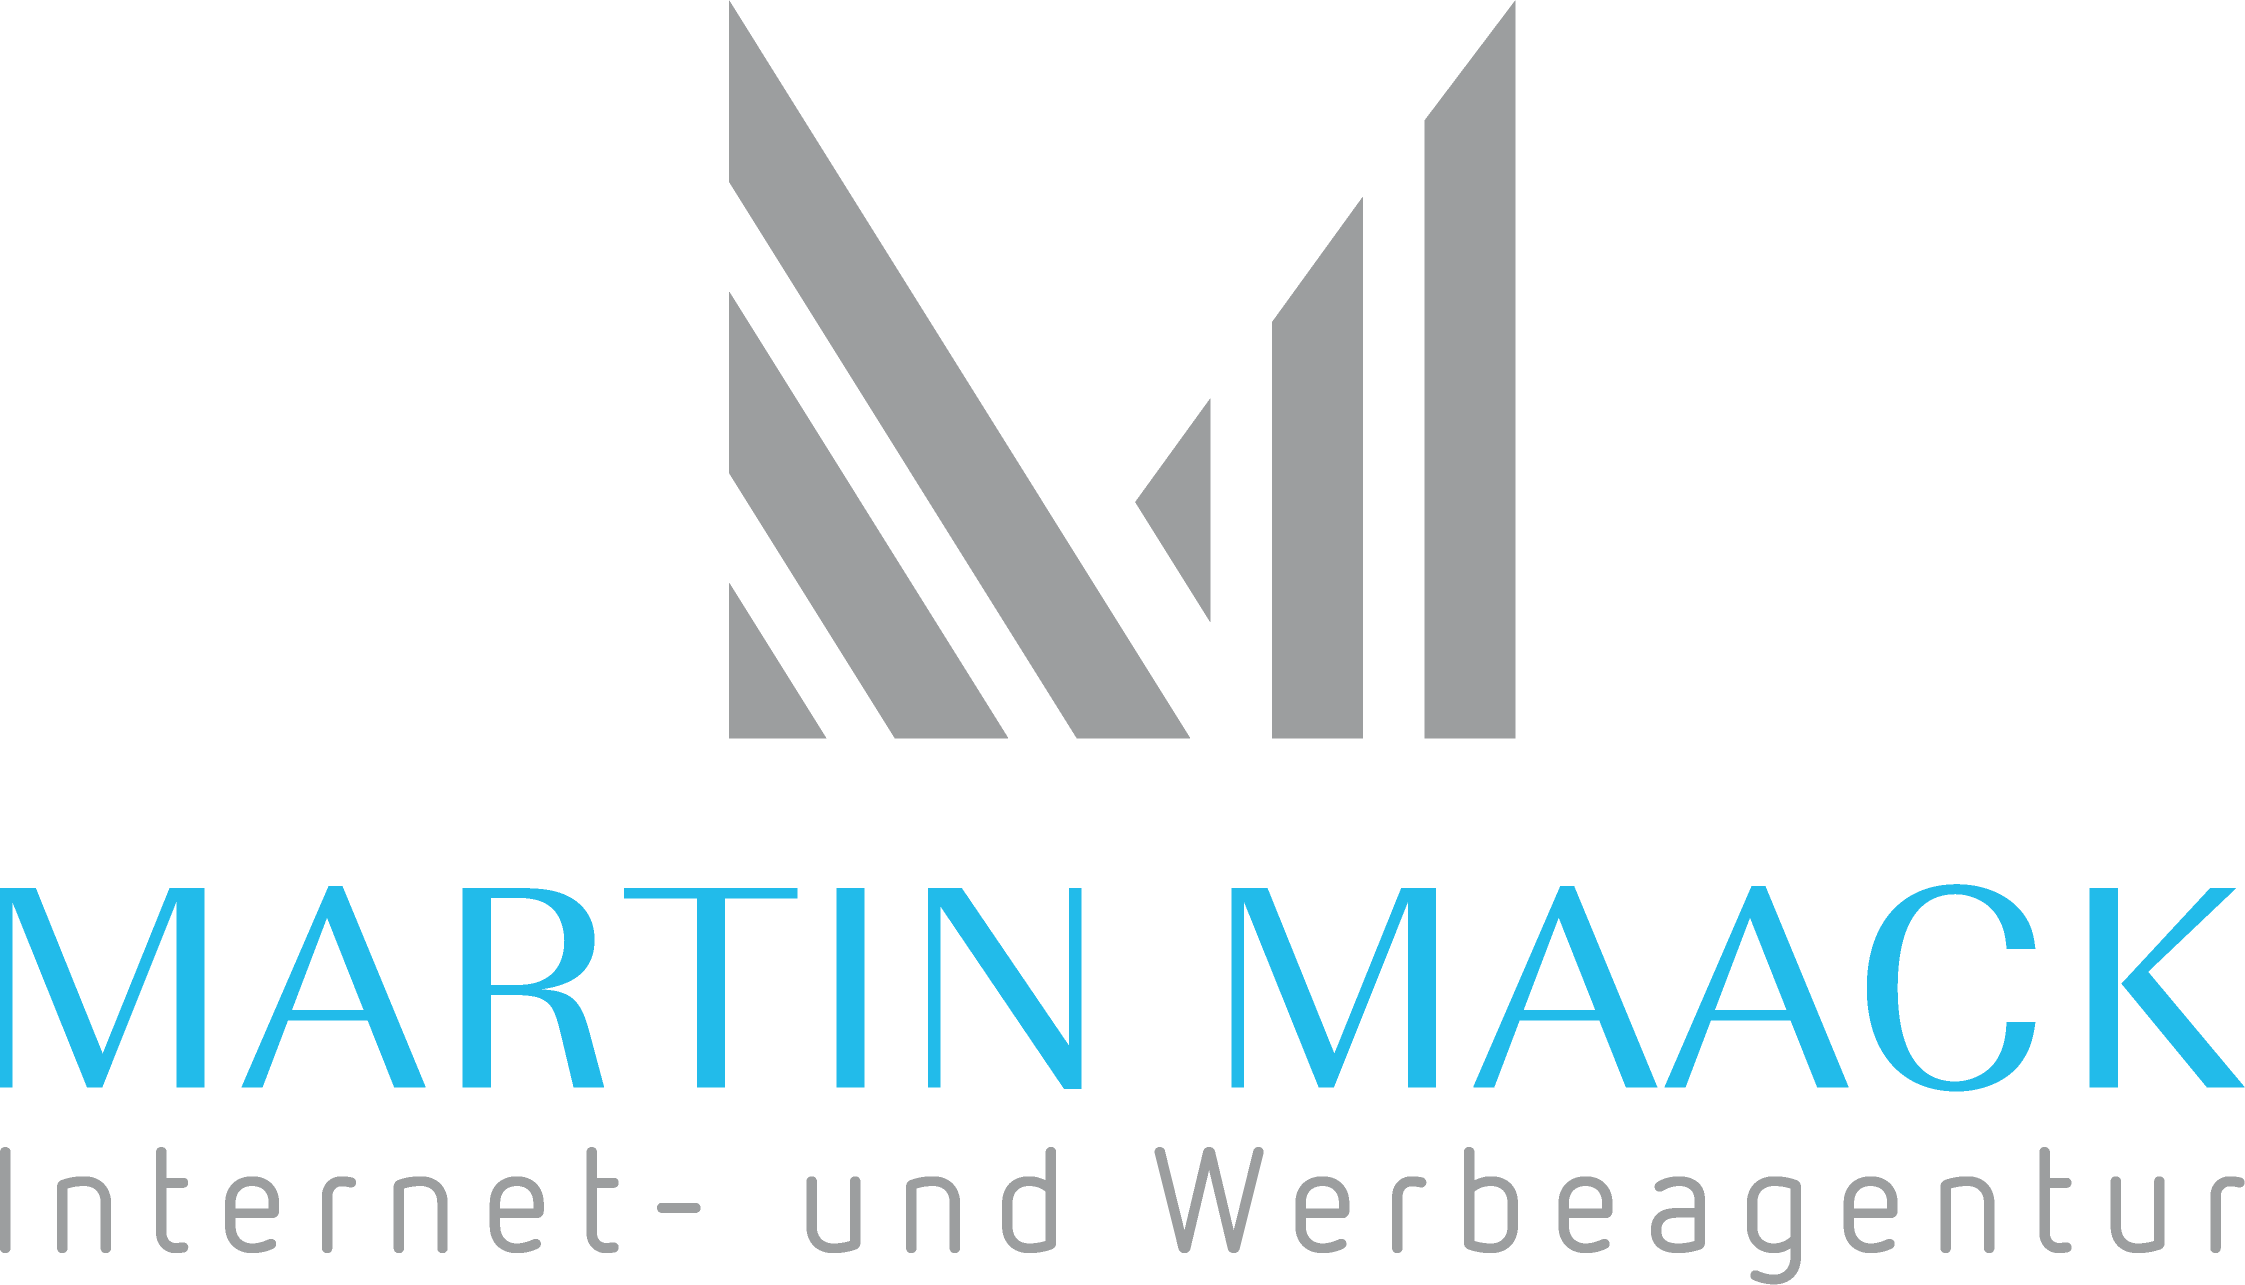 Agentur Martin Maack